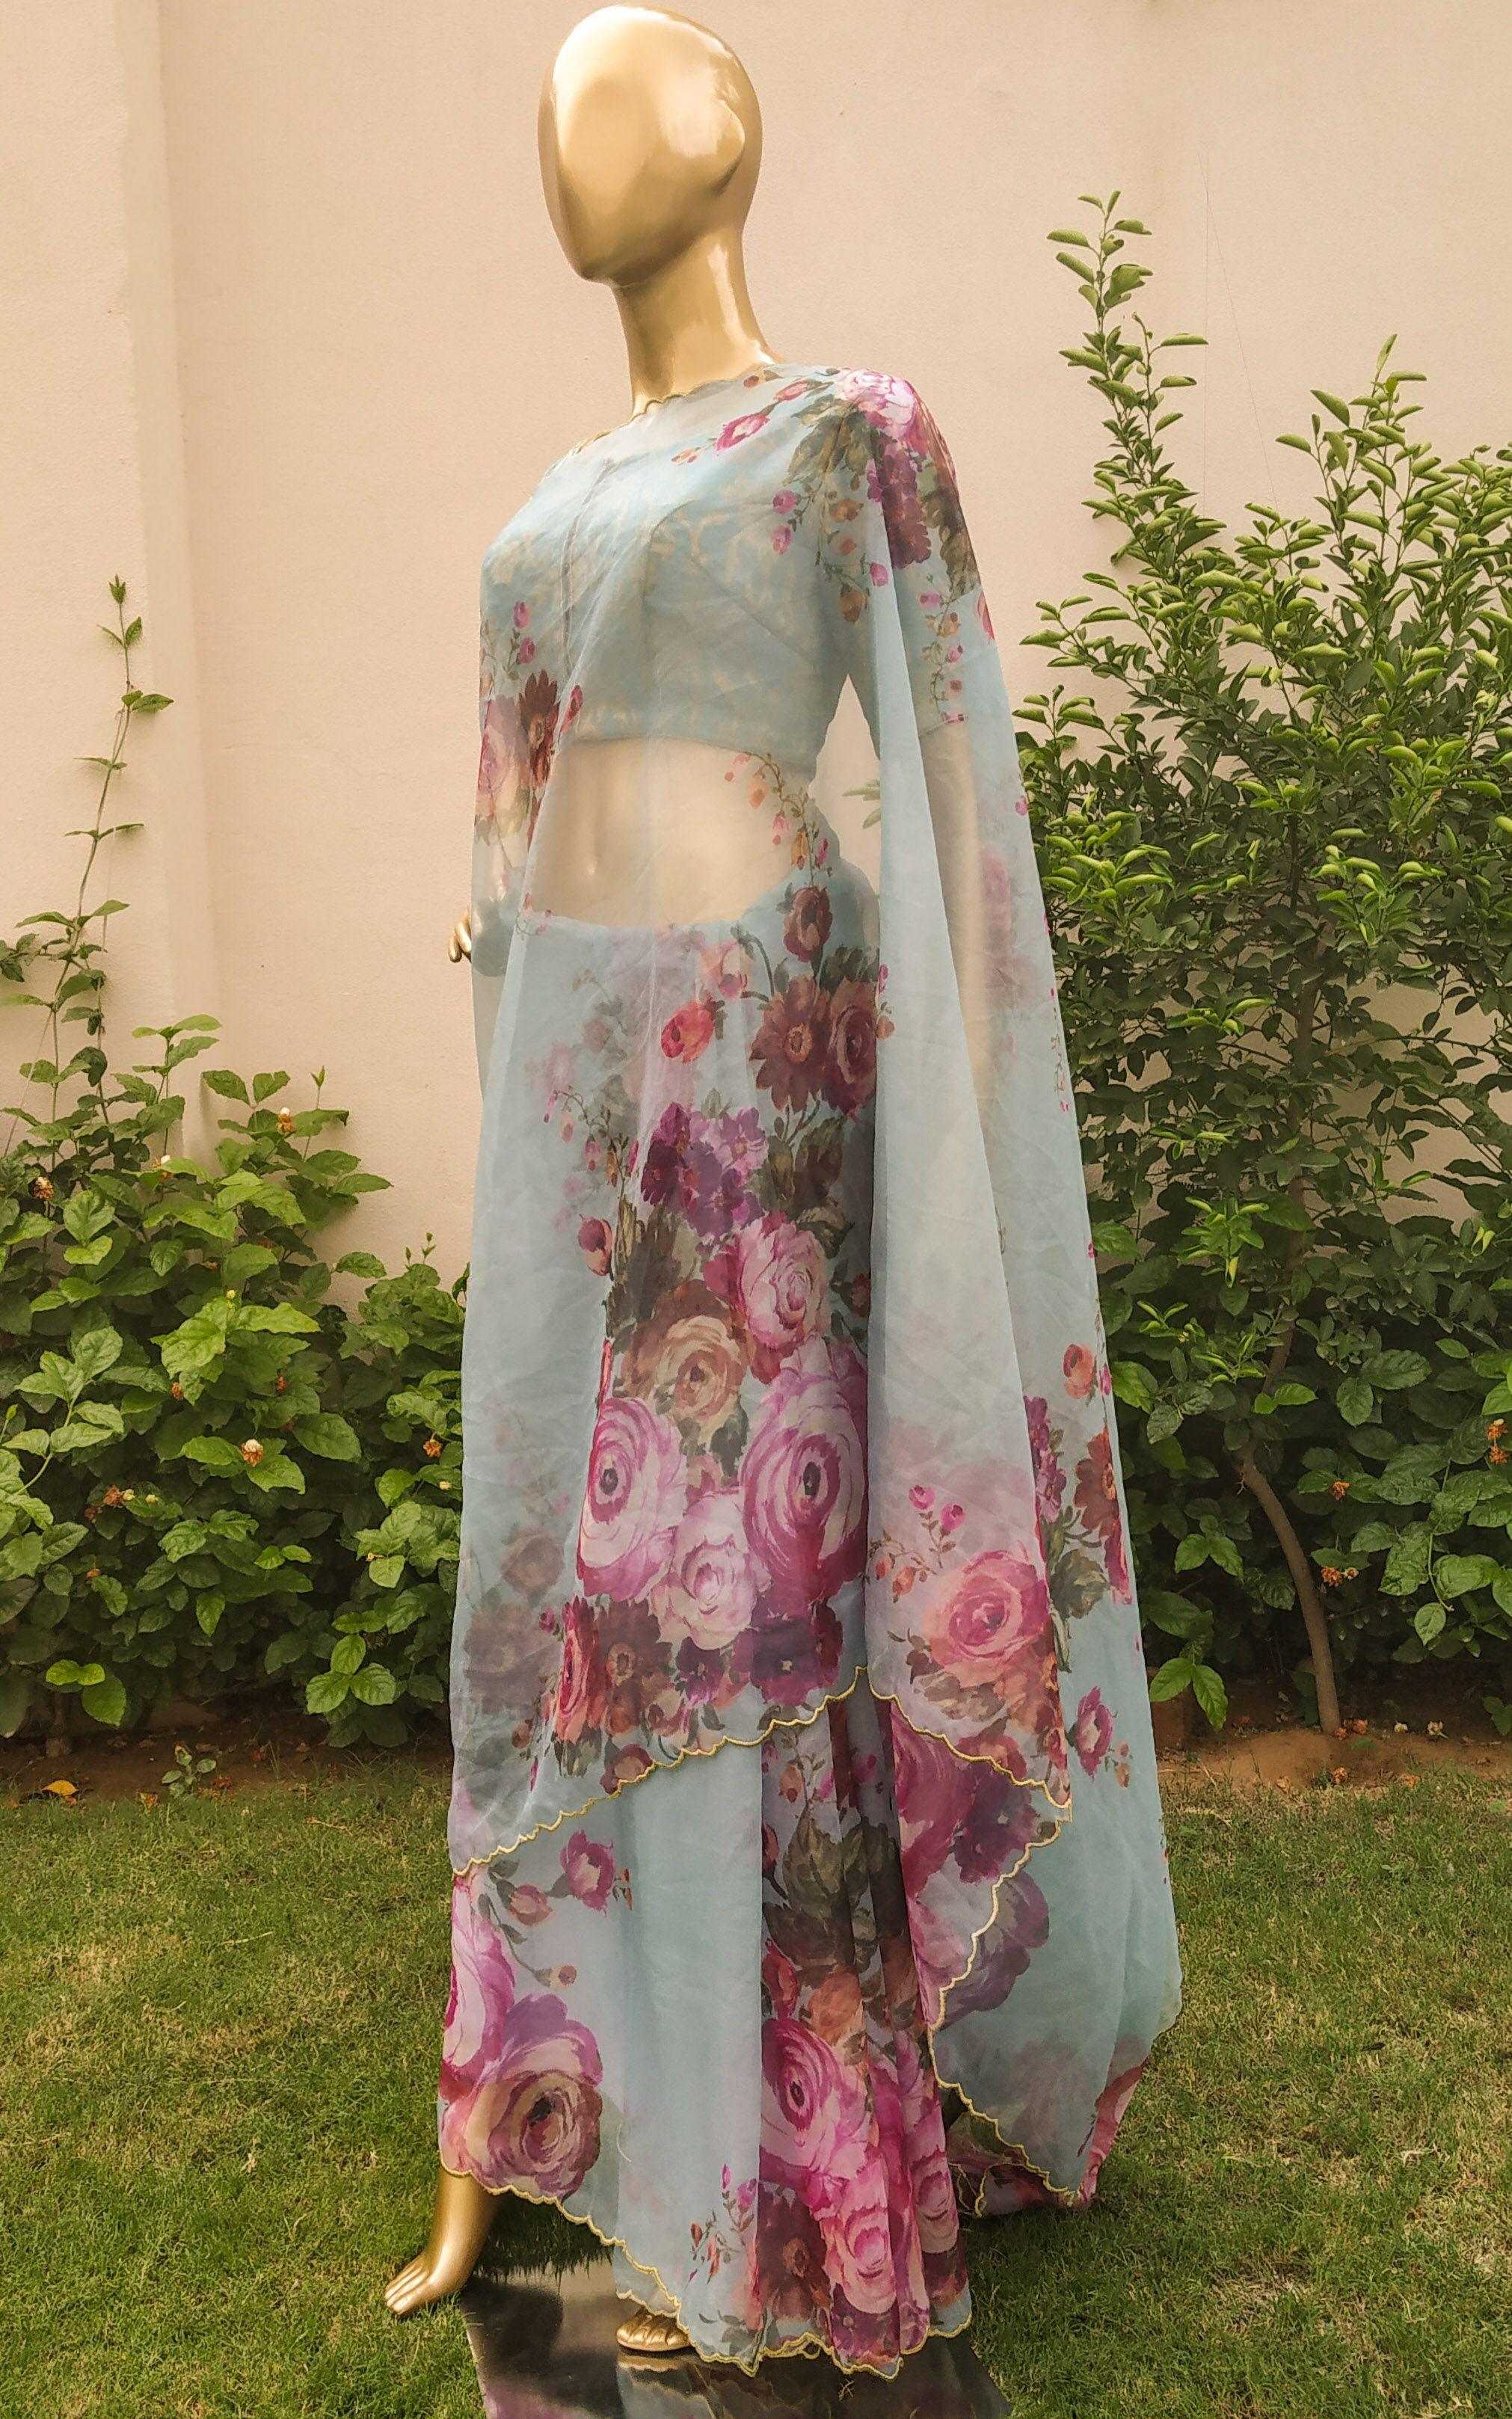 Anushka Green Floral Flower Print Organza Saree Womens Festive Sari Ethnic Wear